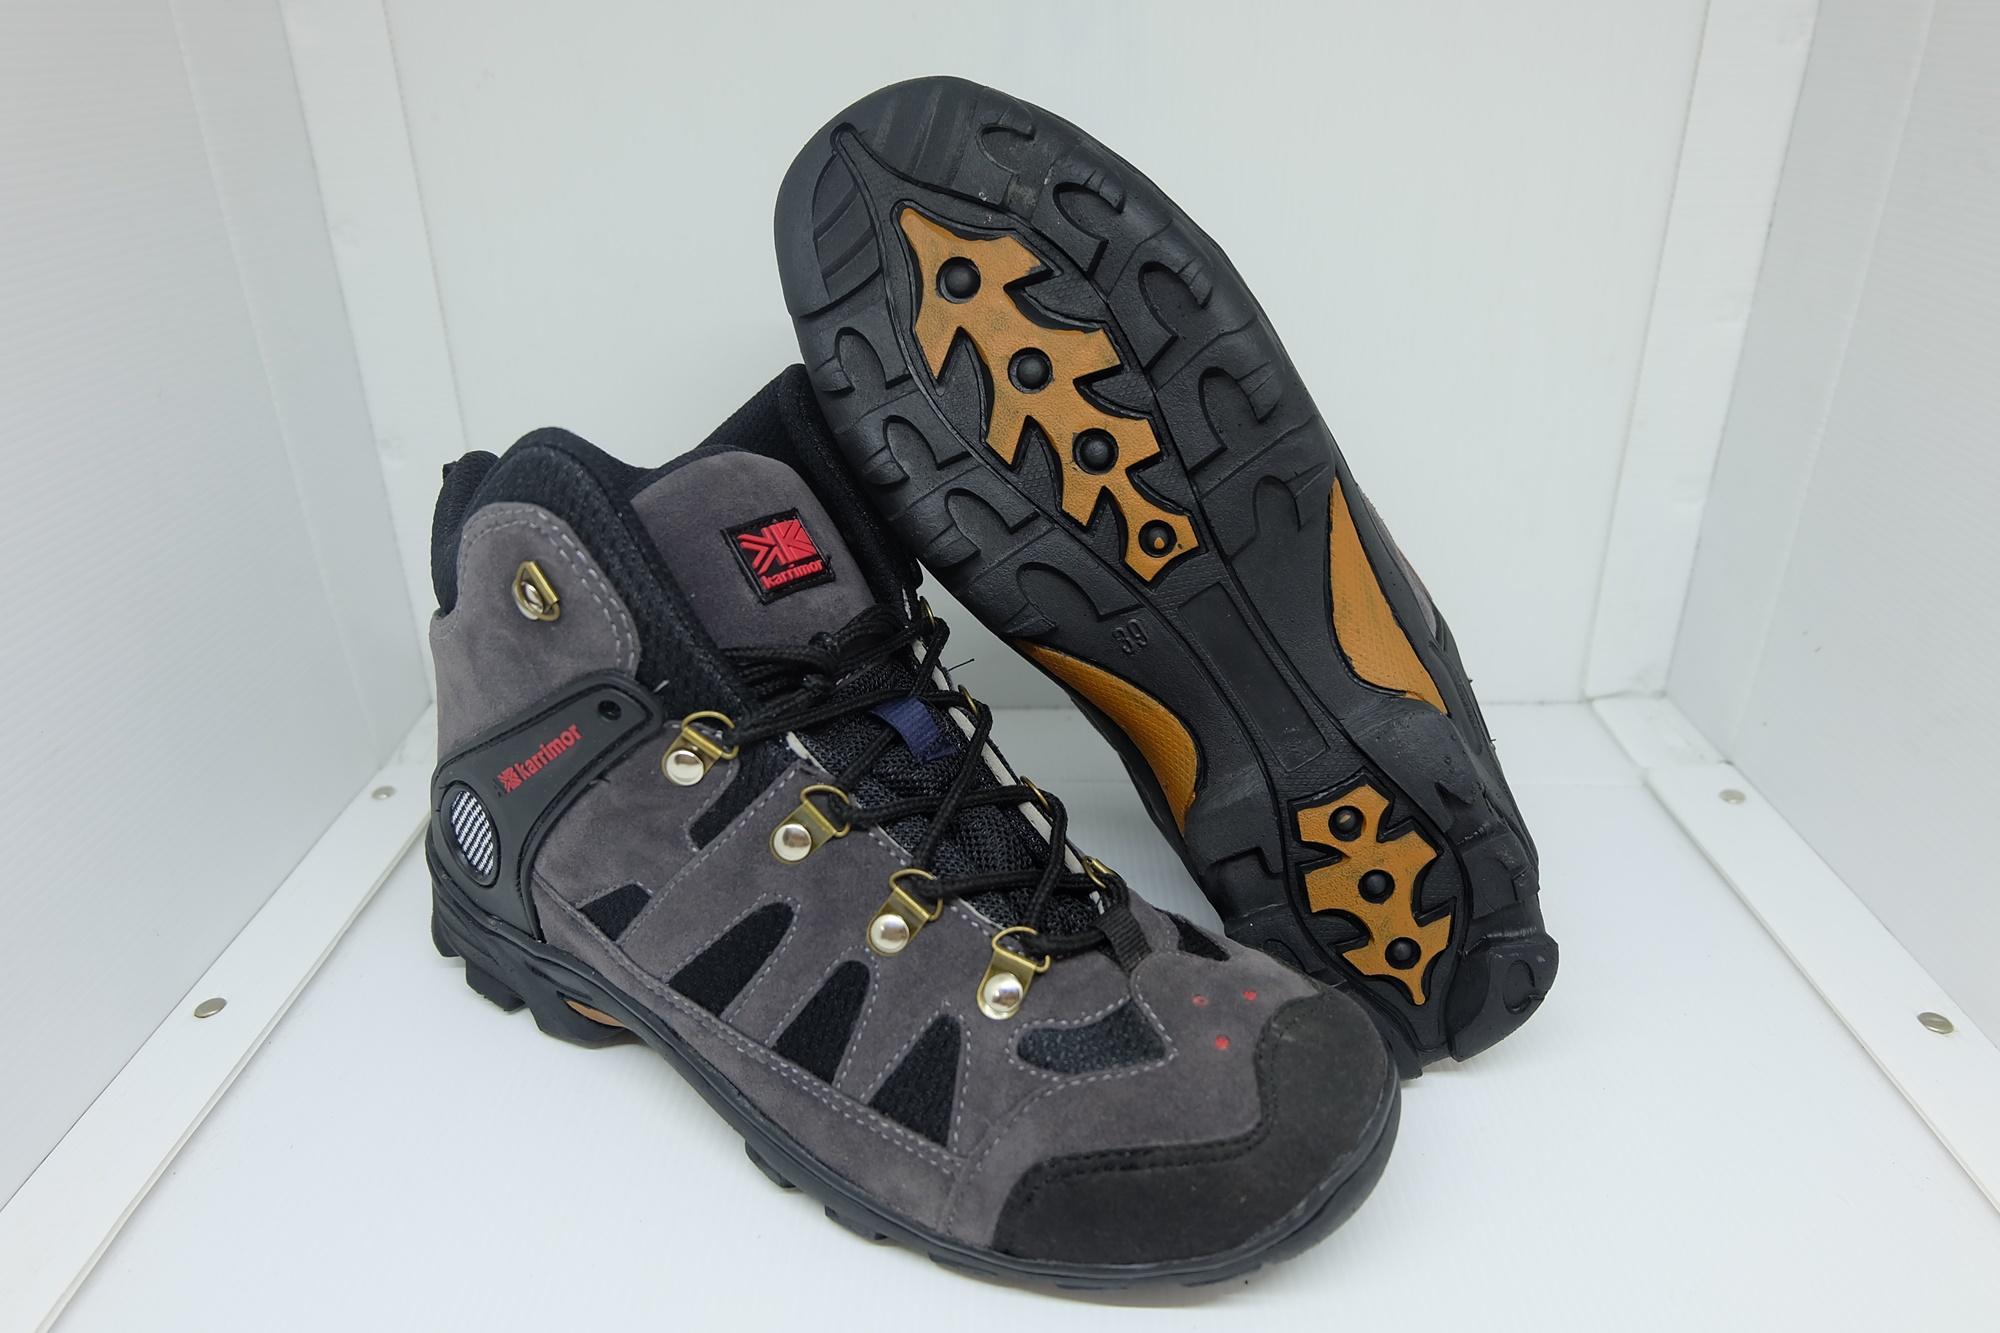 Sepatu Gunung Karrimor High Pria - Adventure - Outdoor - Tracking - Bikers  - Keren Murah e436cf7bb2